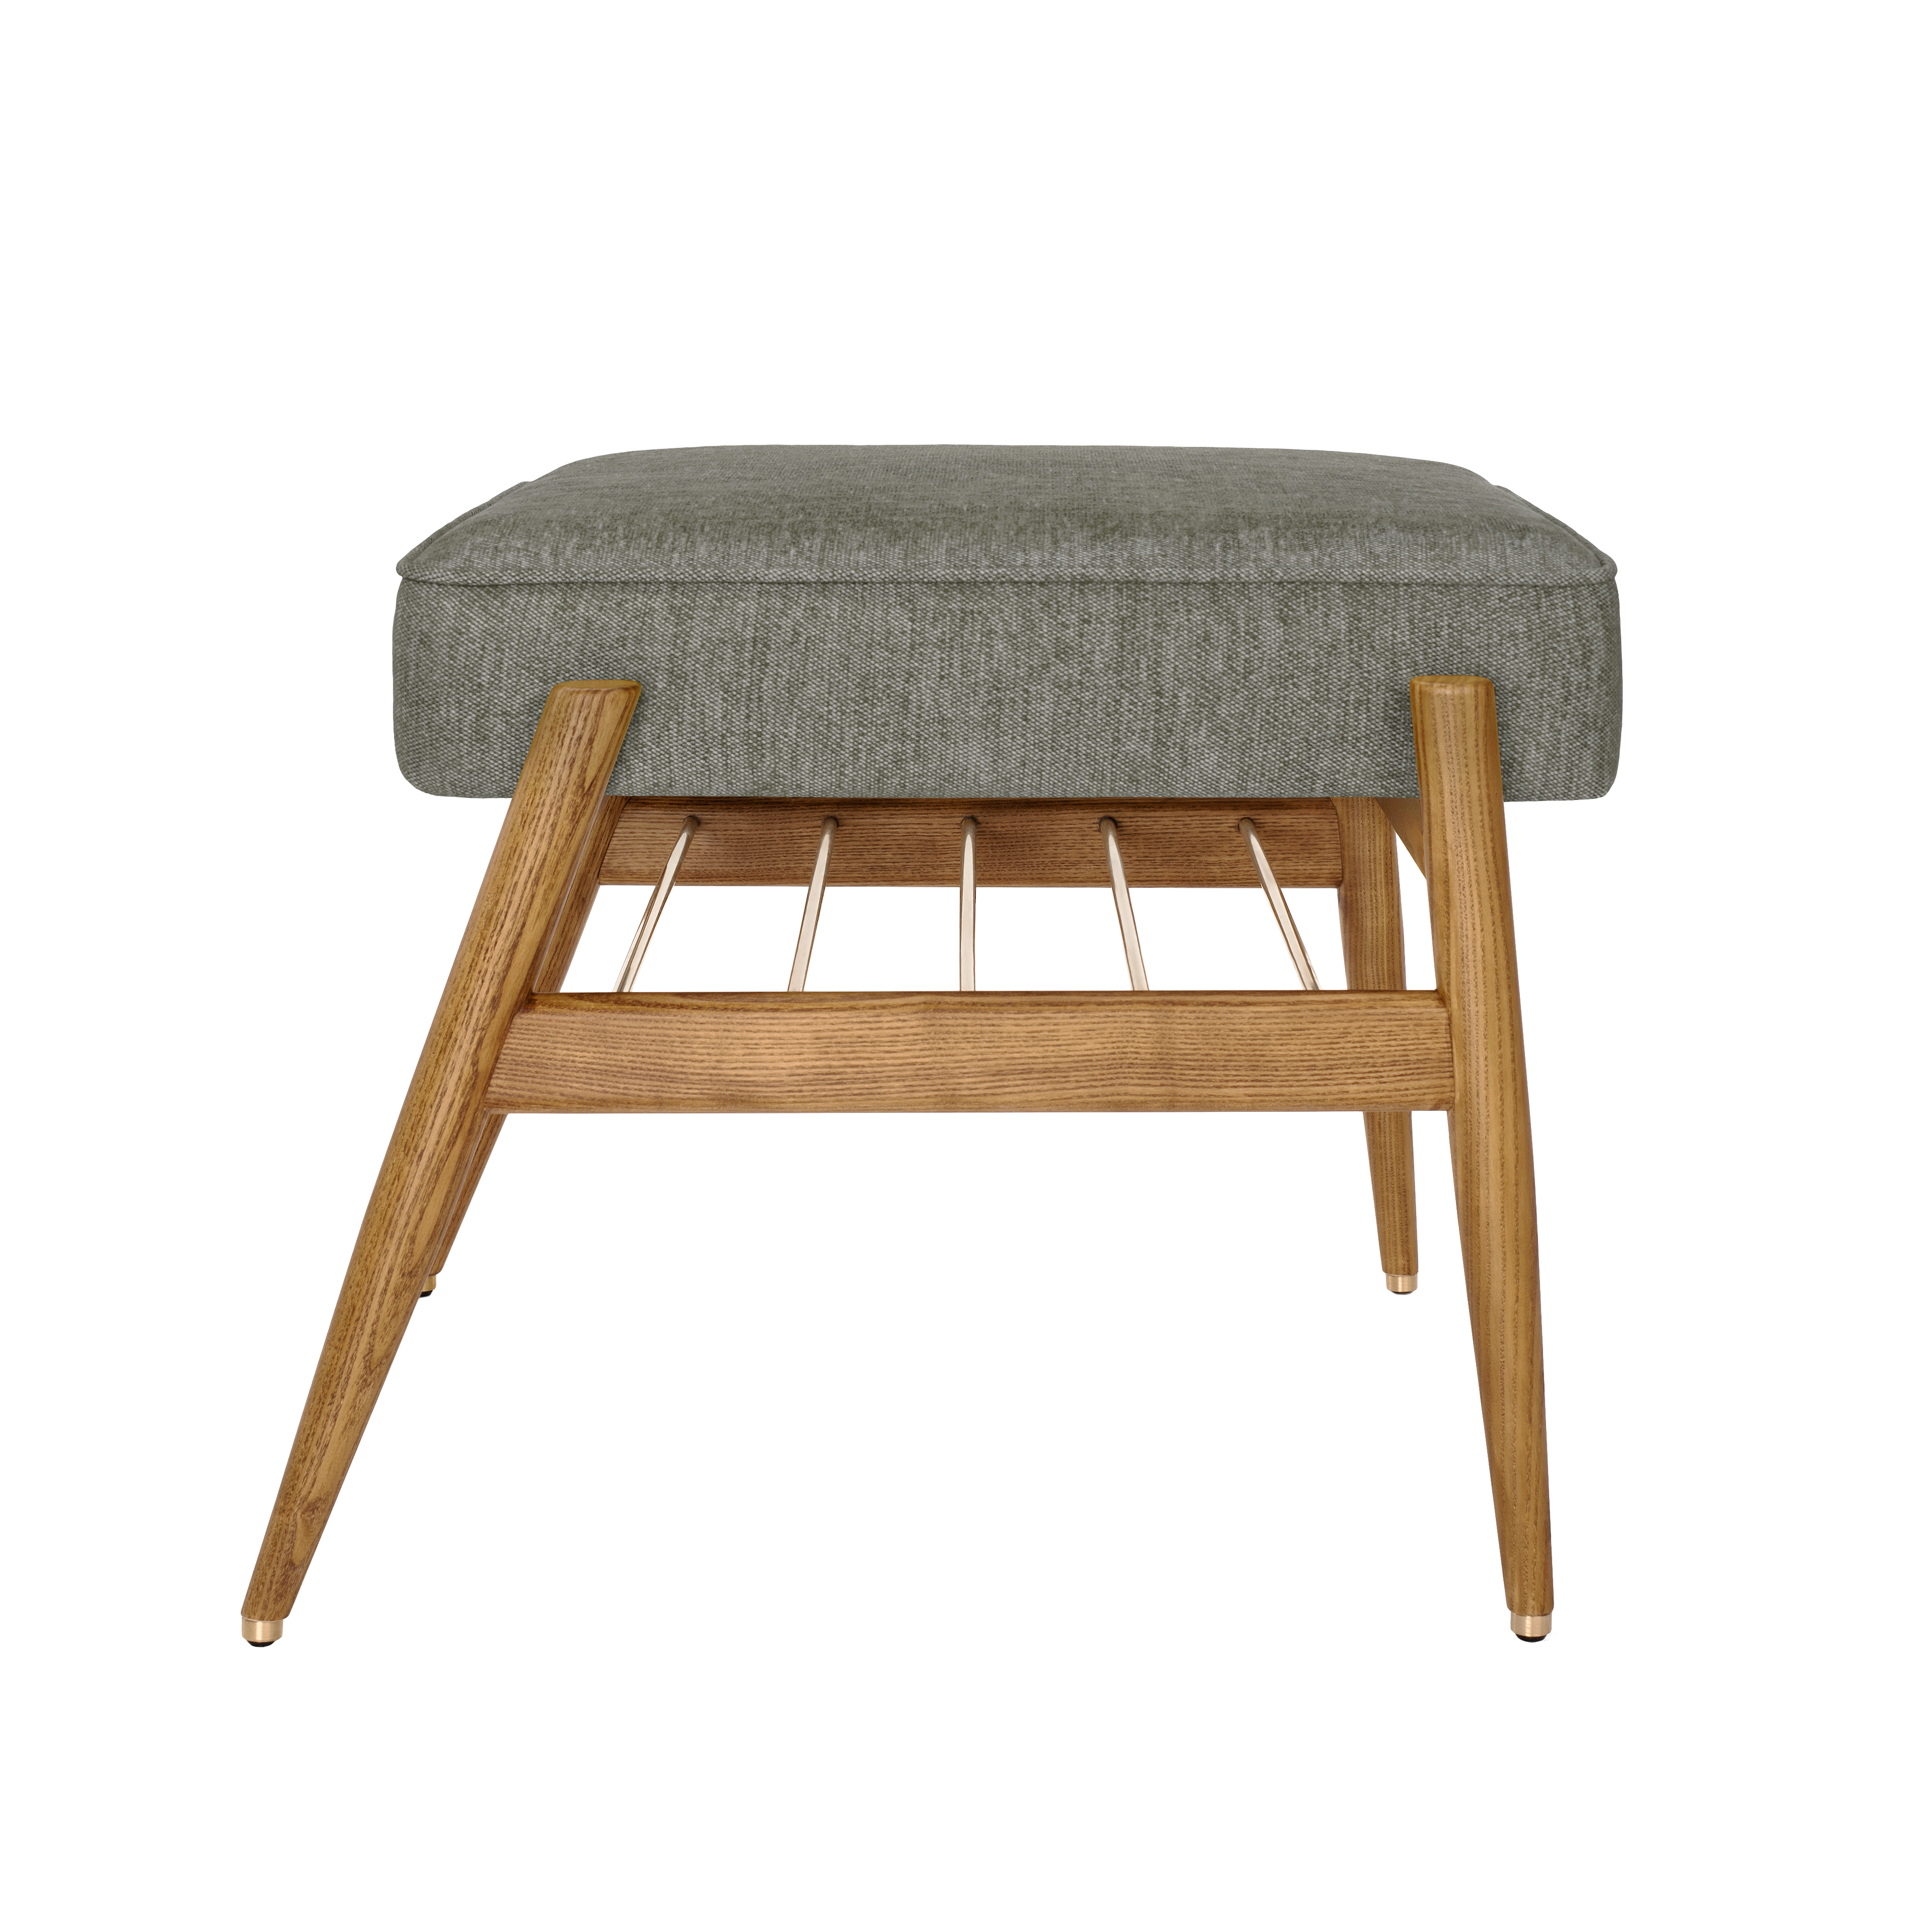 366-concept-footrest-ash-02-loft-grey